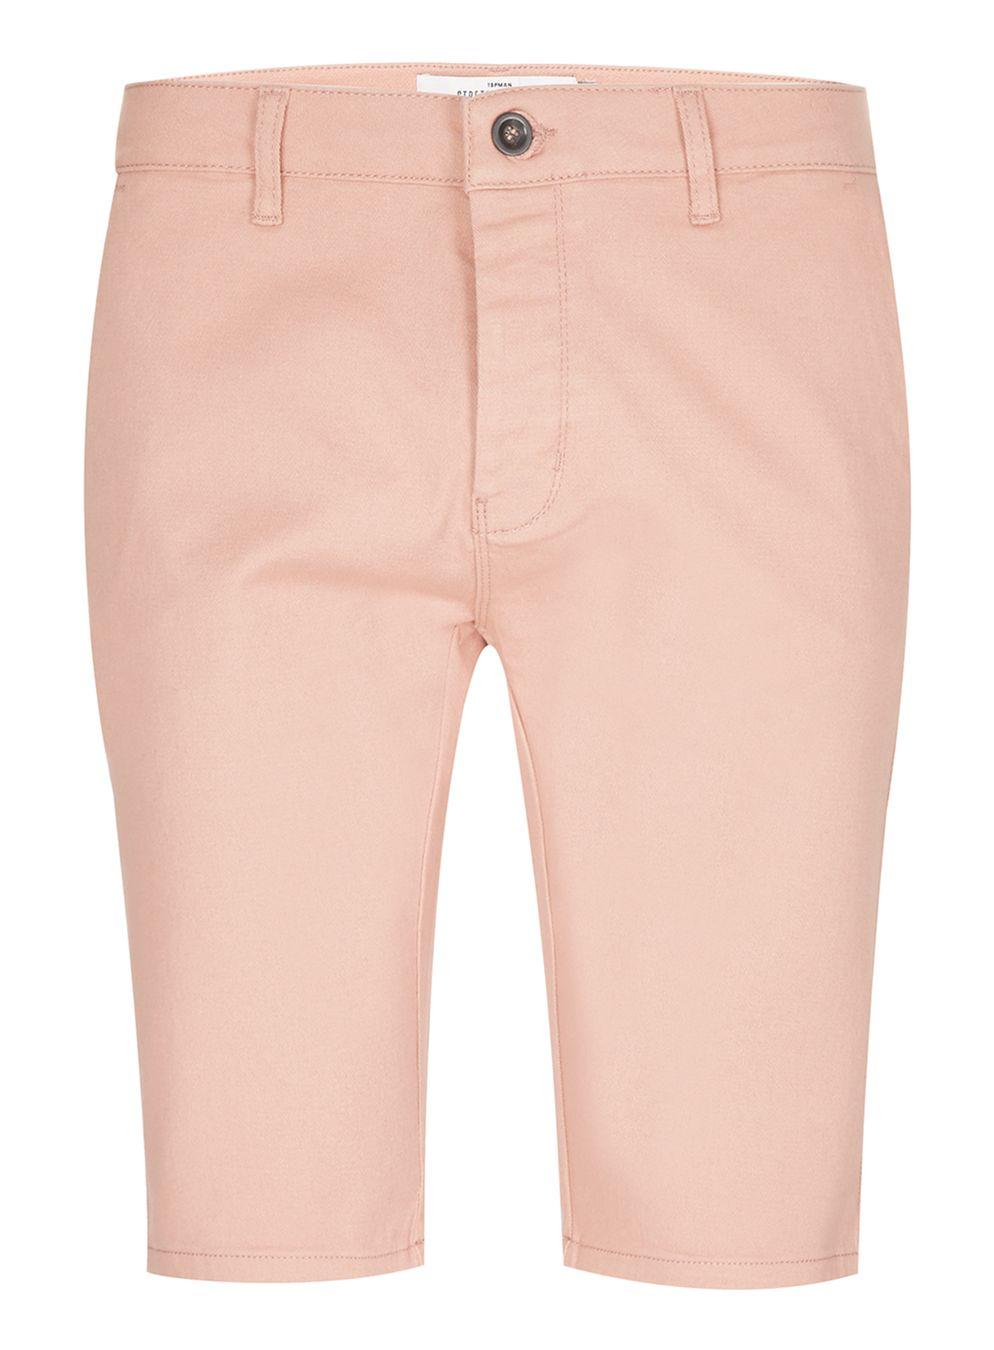 Topman Pink Stretch Skinny Chino Shorts